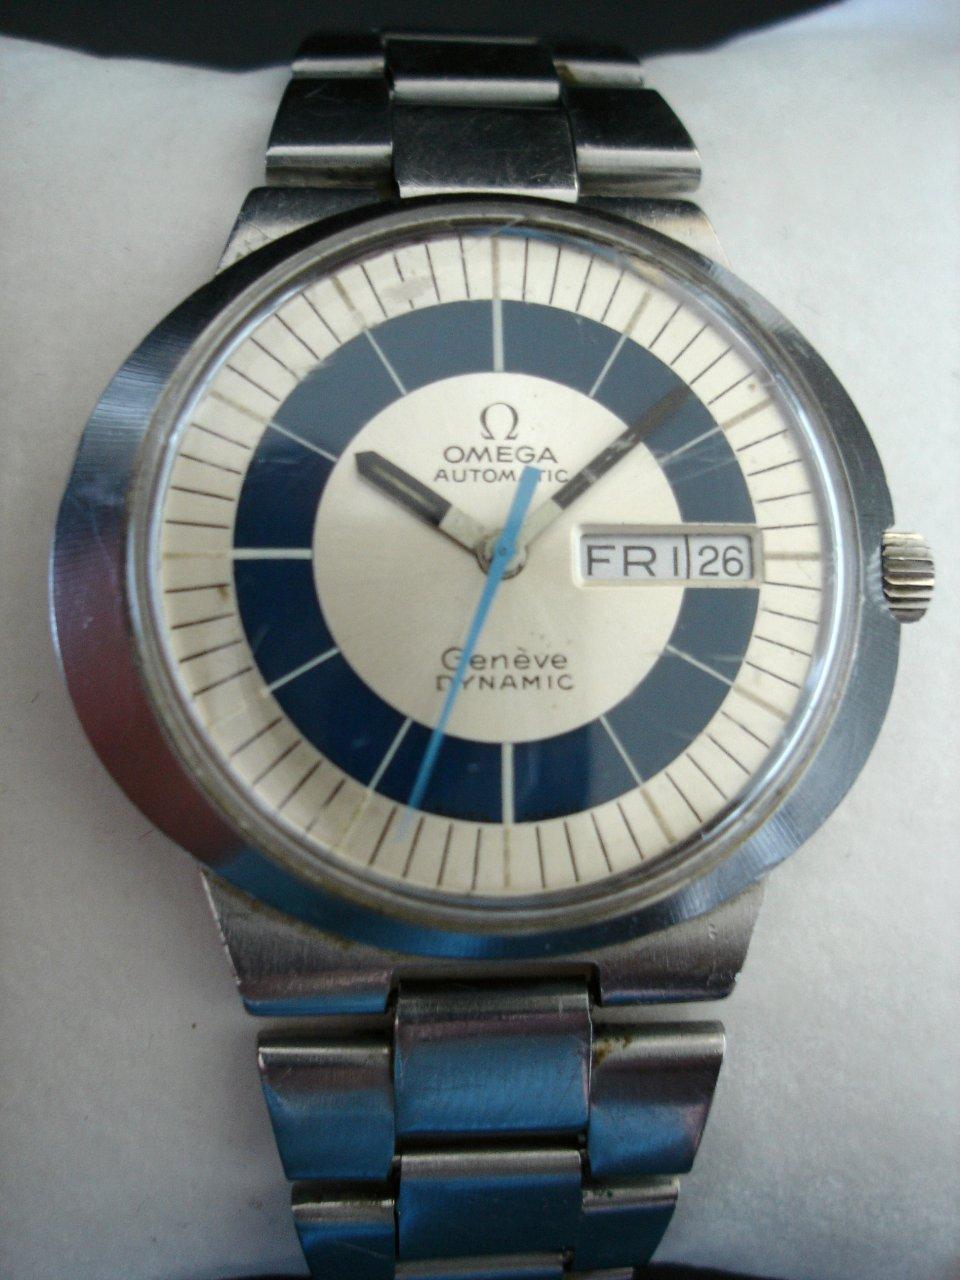 b1598fa3e Omega - Omega Dynamic Genève / Dynamic I, 1972 model